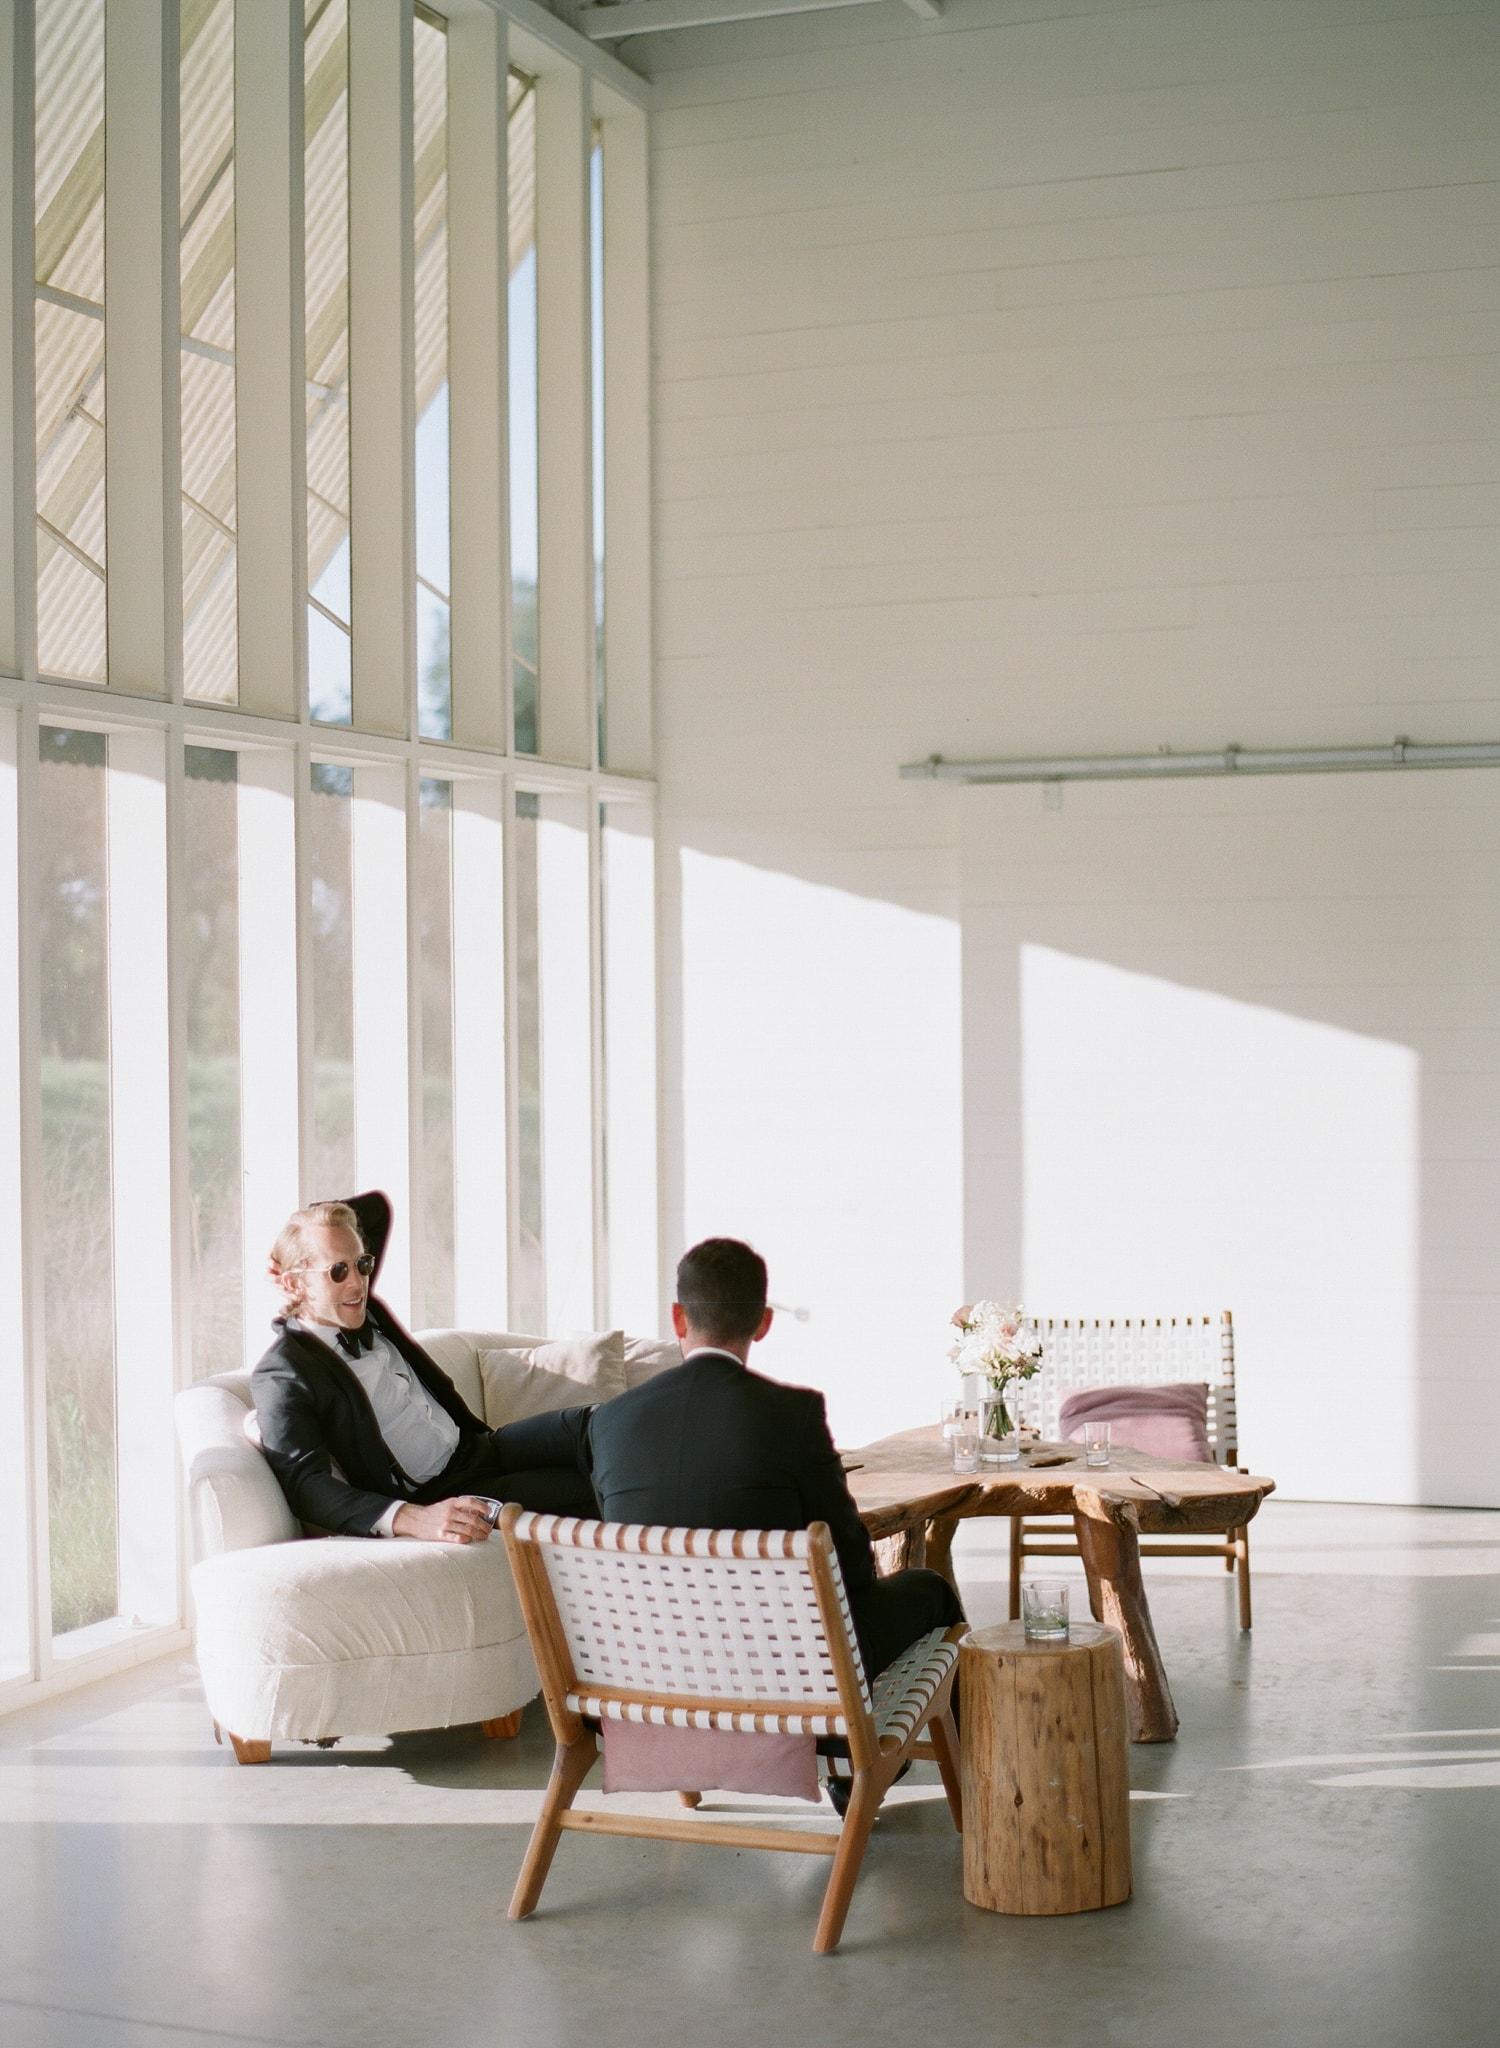 prospect-house-wedding-29.jpg